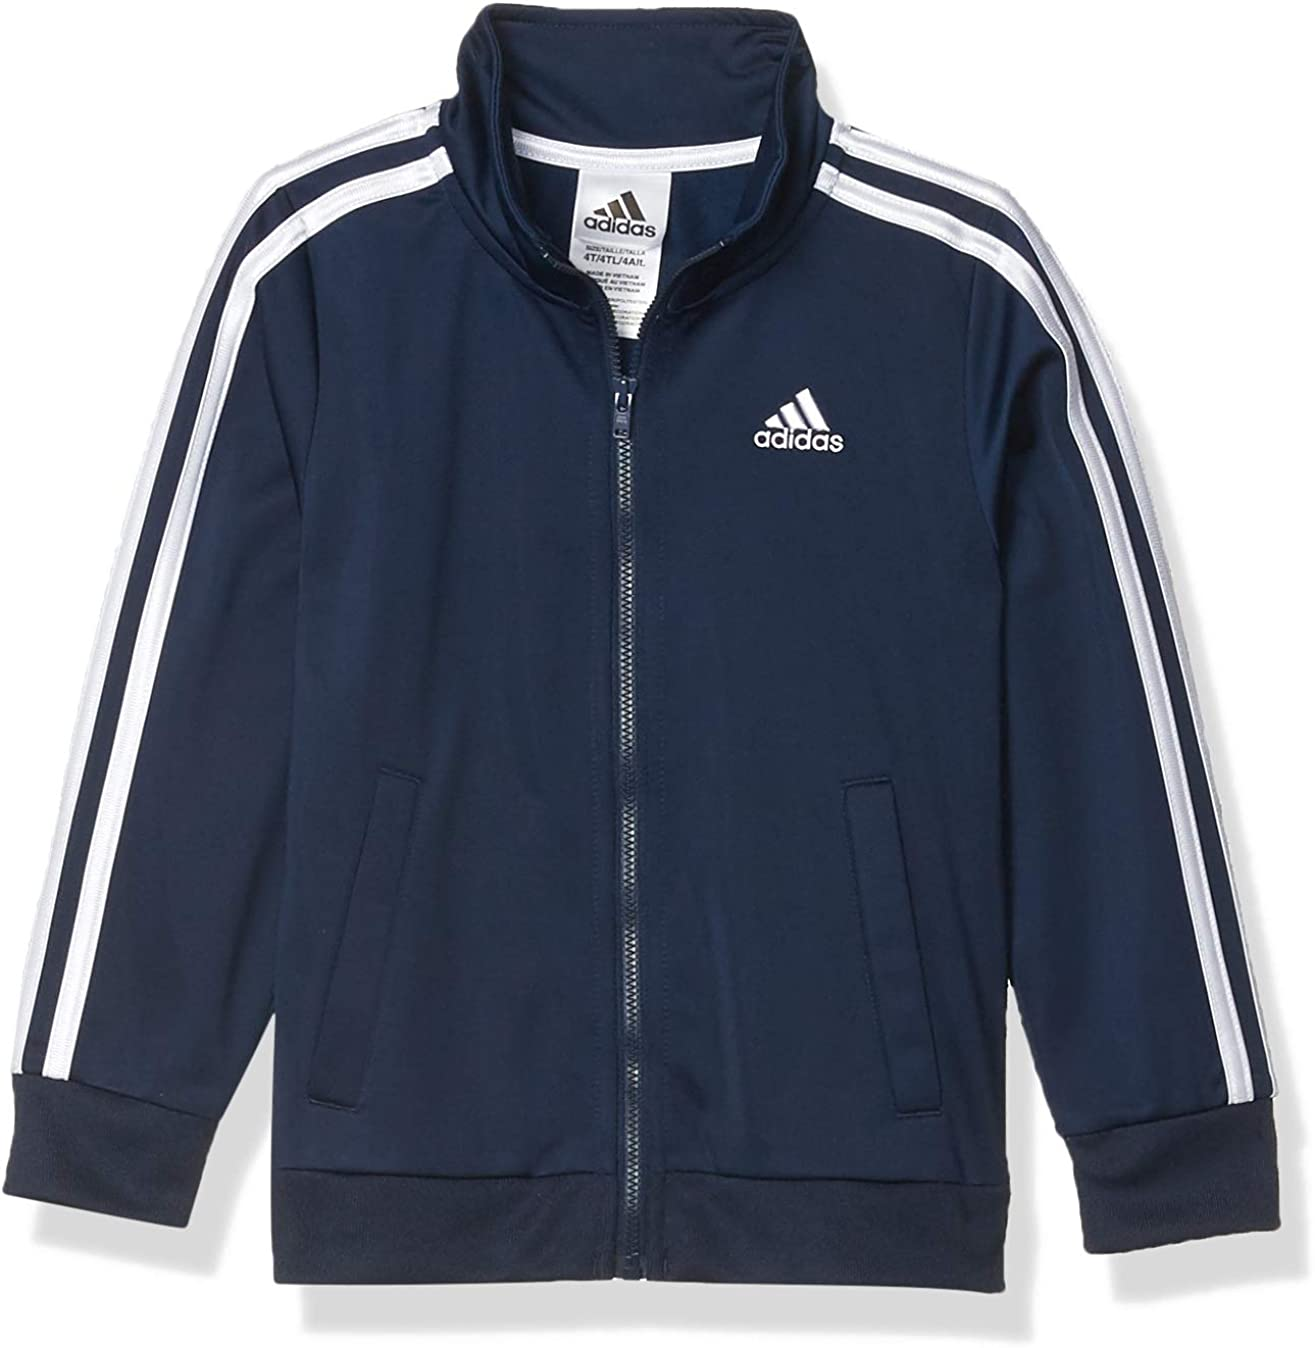 adidas Boys' Plus Fashionable Mesa Mall Size Zip Front Iconic Jacket Tricot